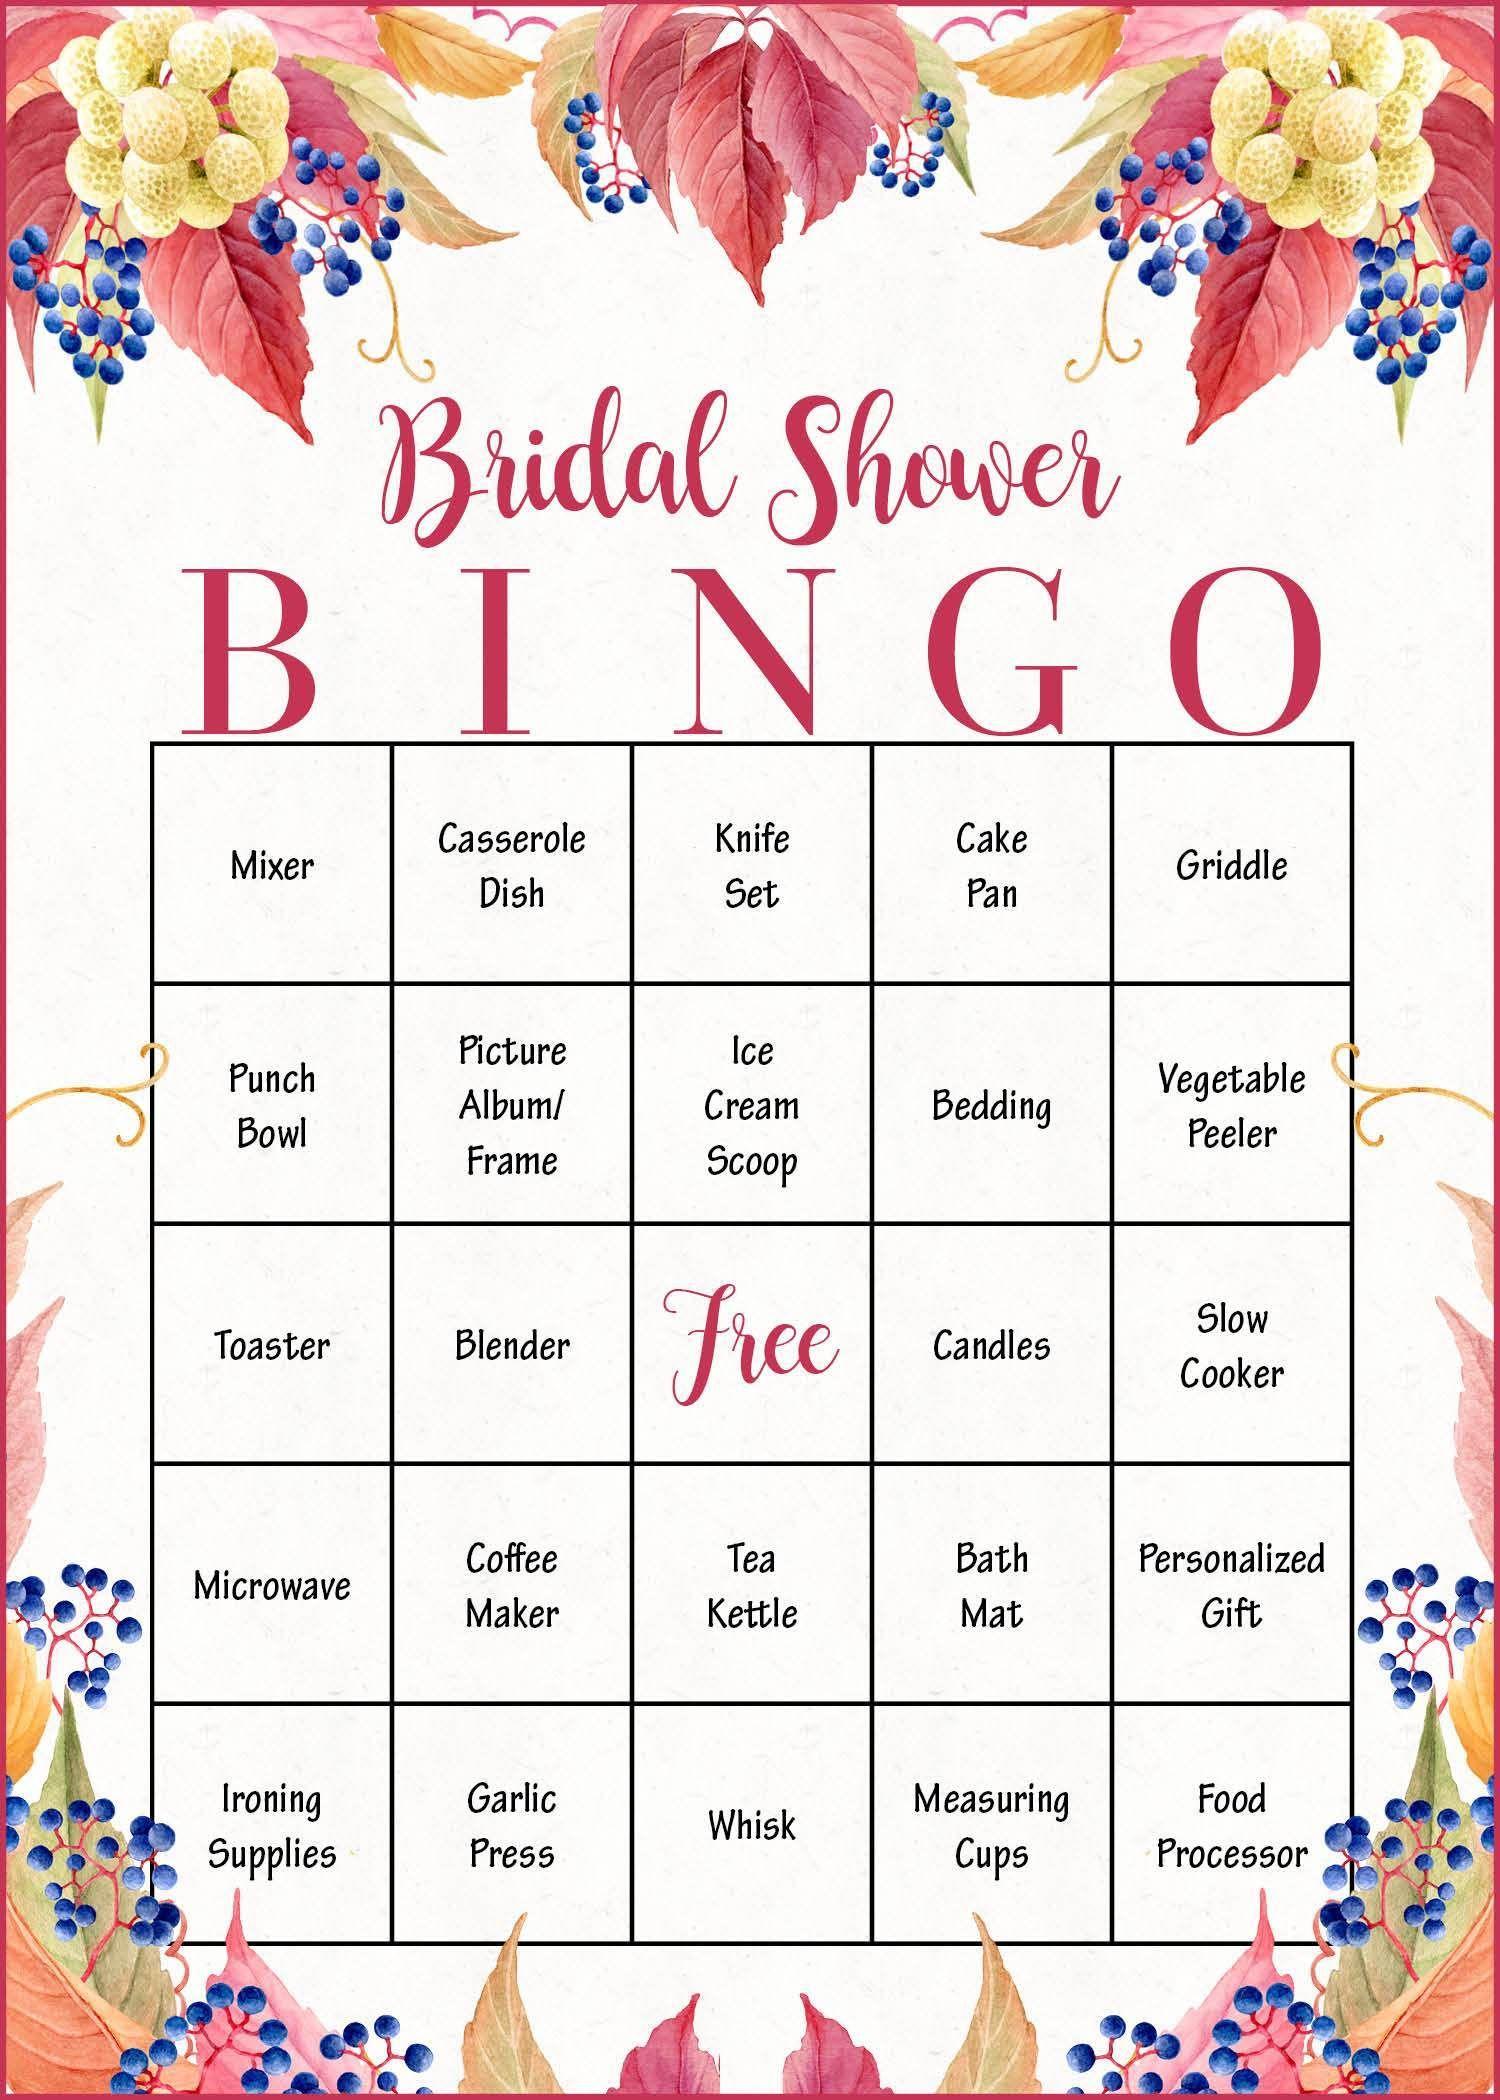 Bridal Shower Gift Bingo Cards - Printable Download - Bridal